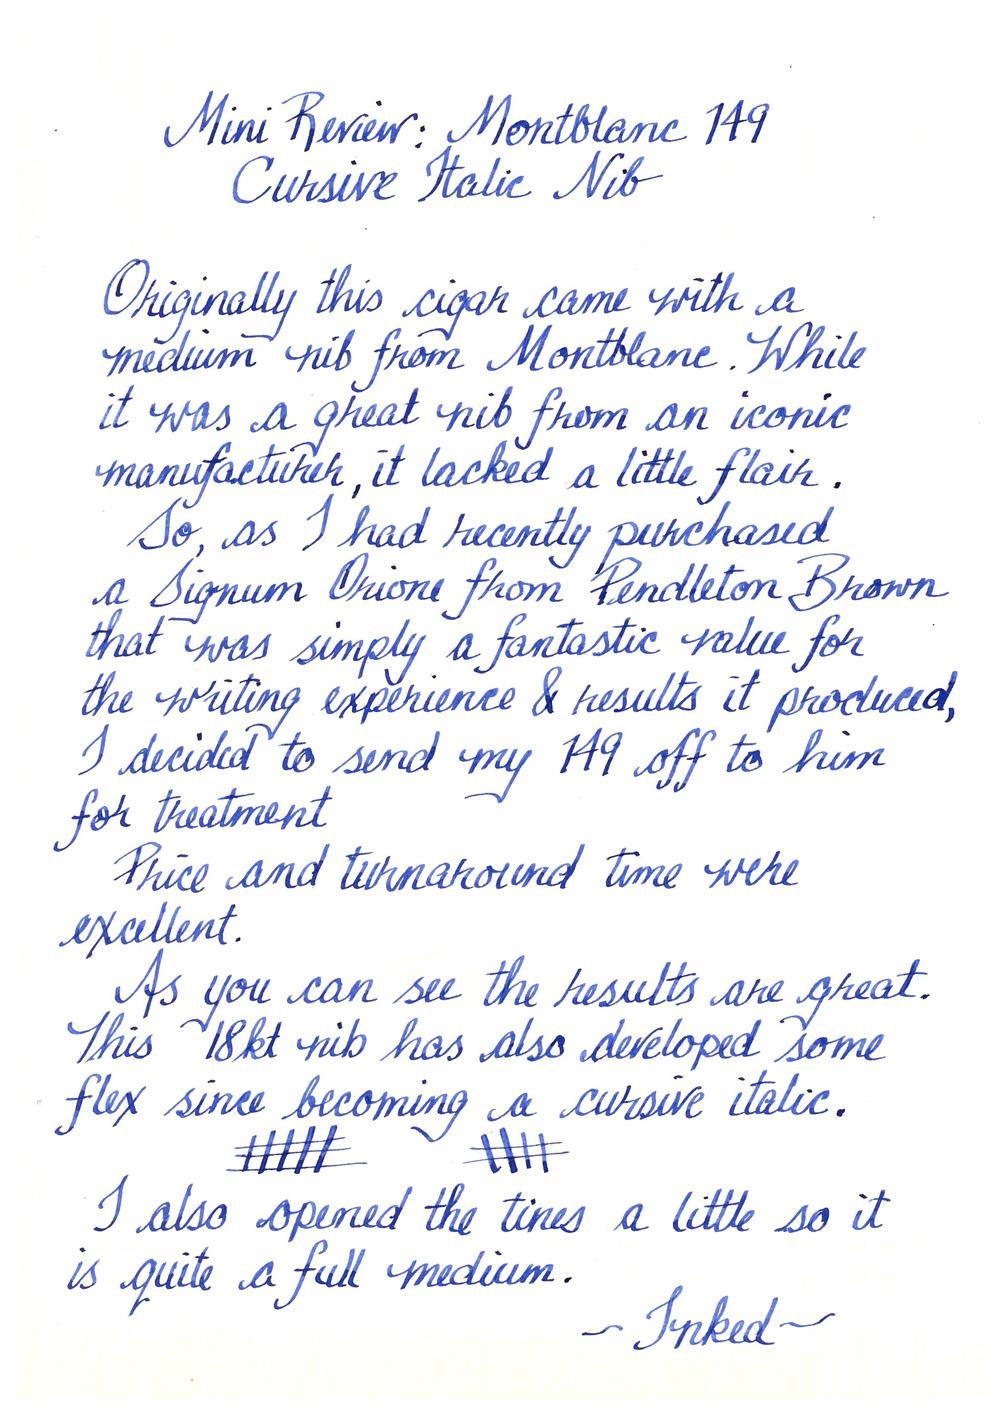 Montblanc 149 Cursive Italic By Pendleton Brown